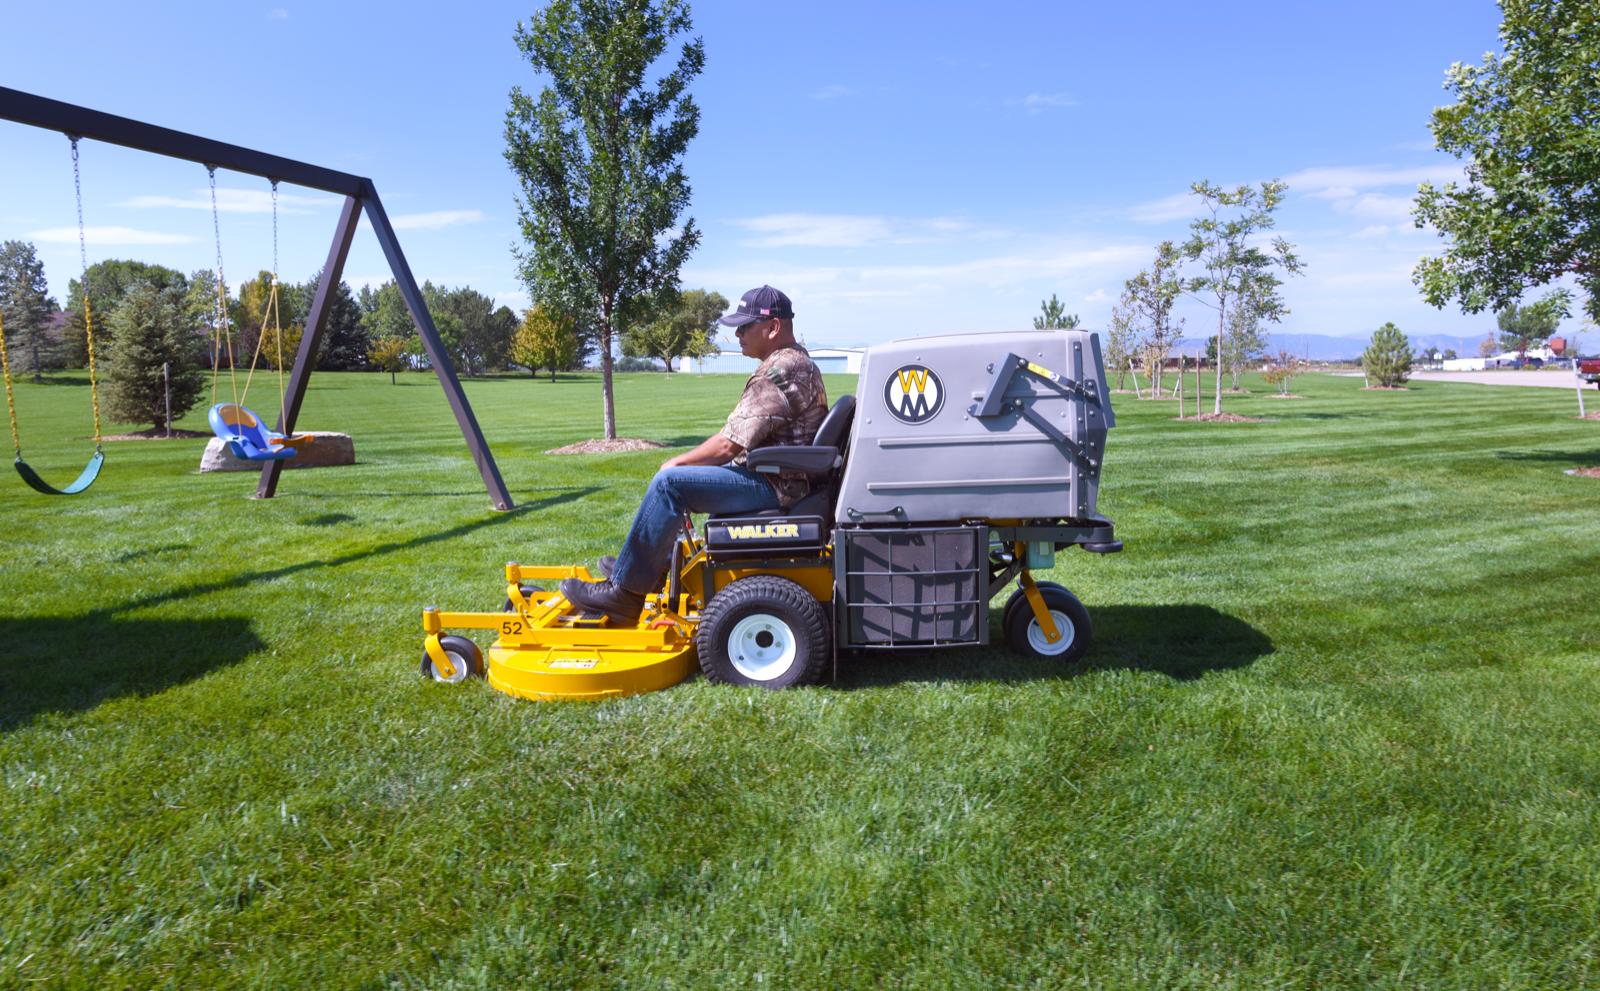 The Walker Model D21d Commercial Lawn Mower